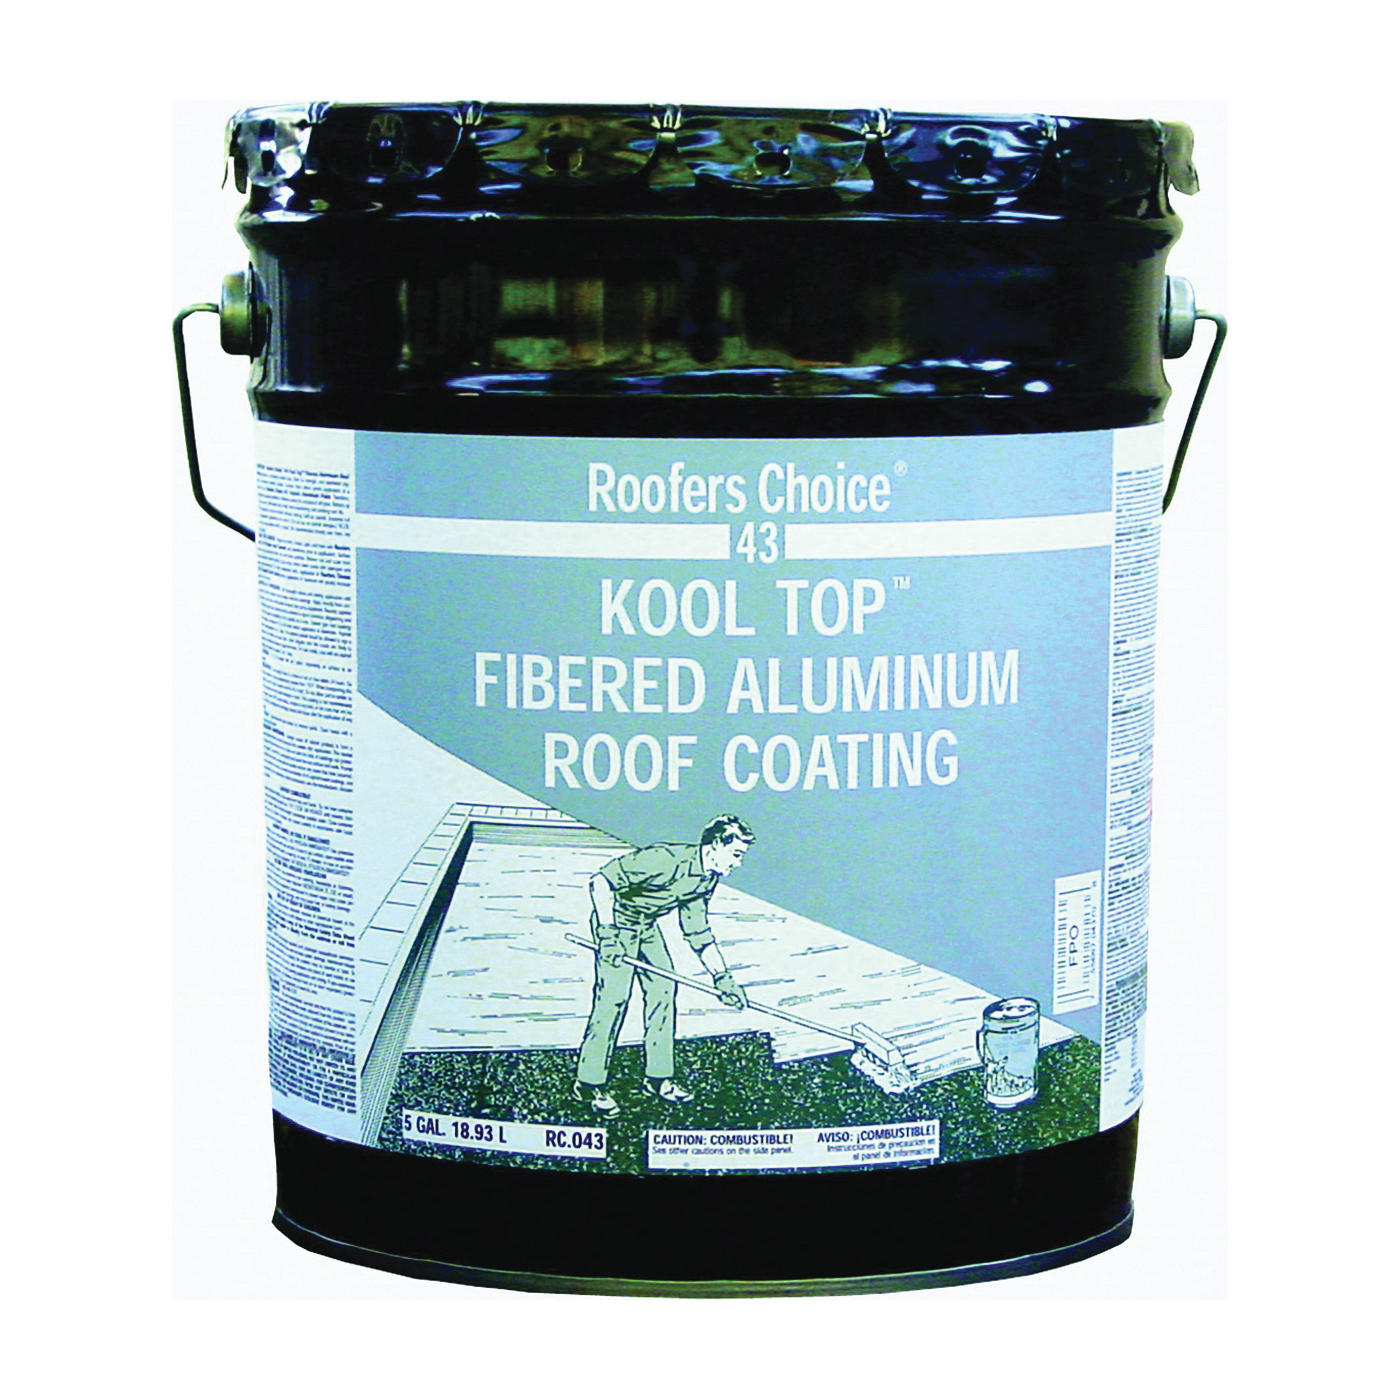 Picture of Henry Roofers Choice RC043070 Aluminum Roof Coating, Aluminum, 18.93 L, Pail, Liquid